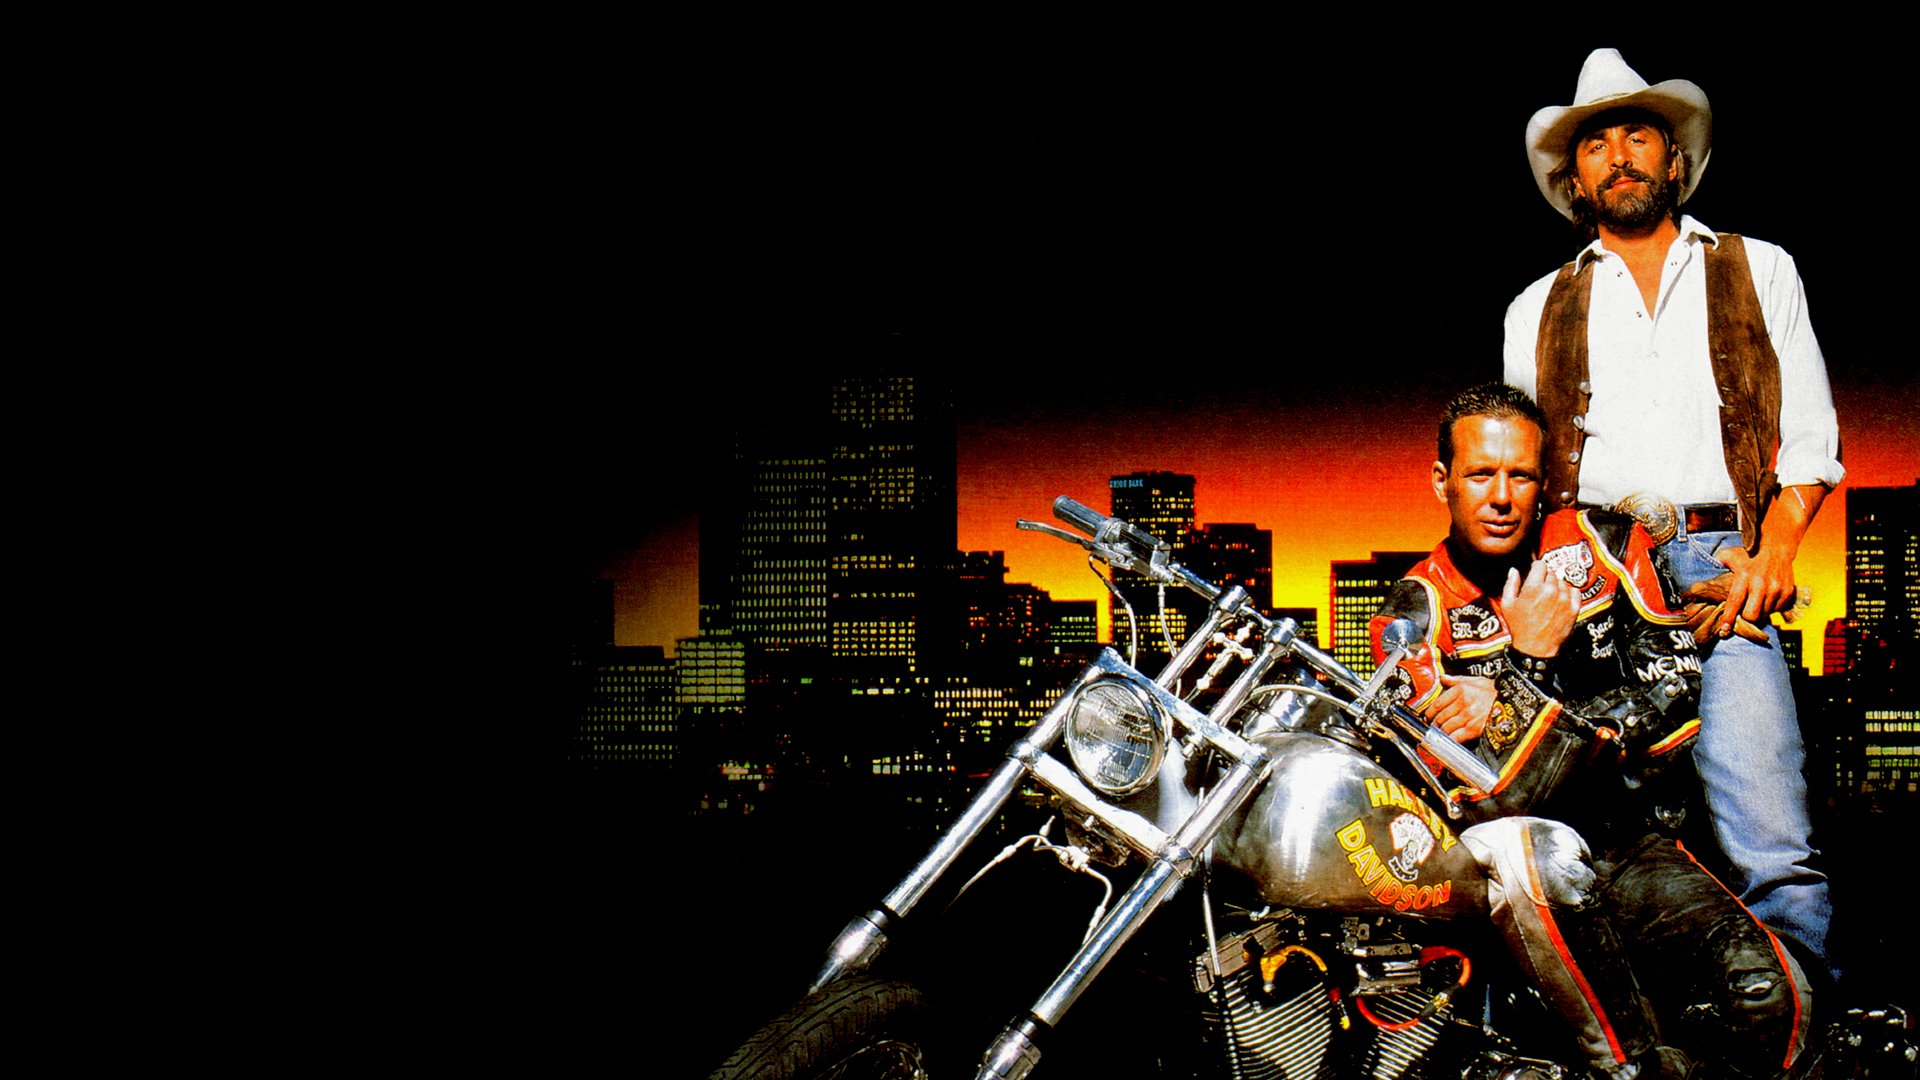 Harley Davidson Movie: Harley Davidson And The Marlboro Man HD Wallpaper